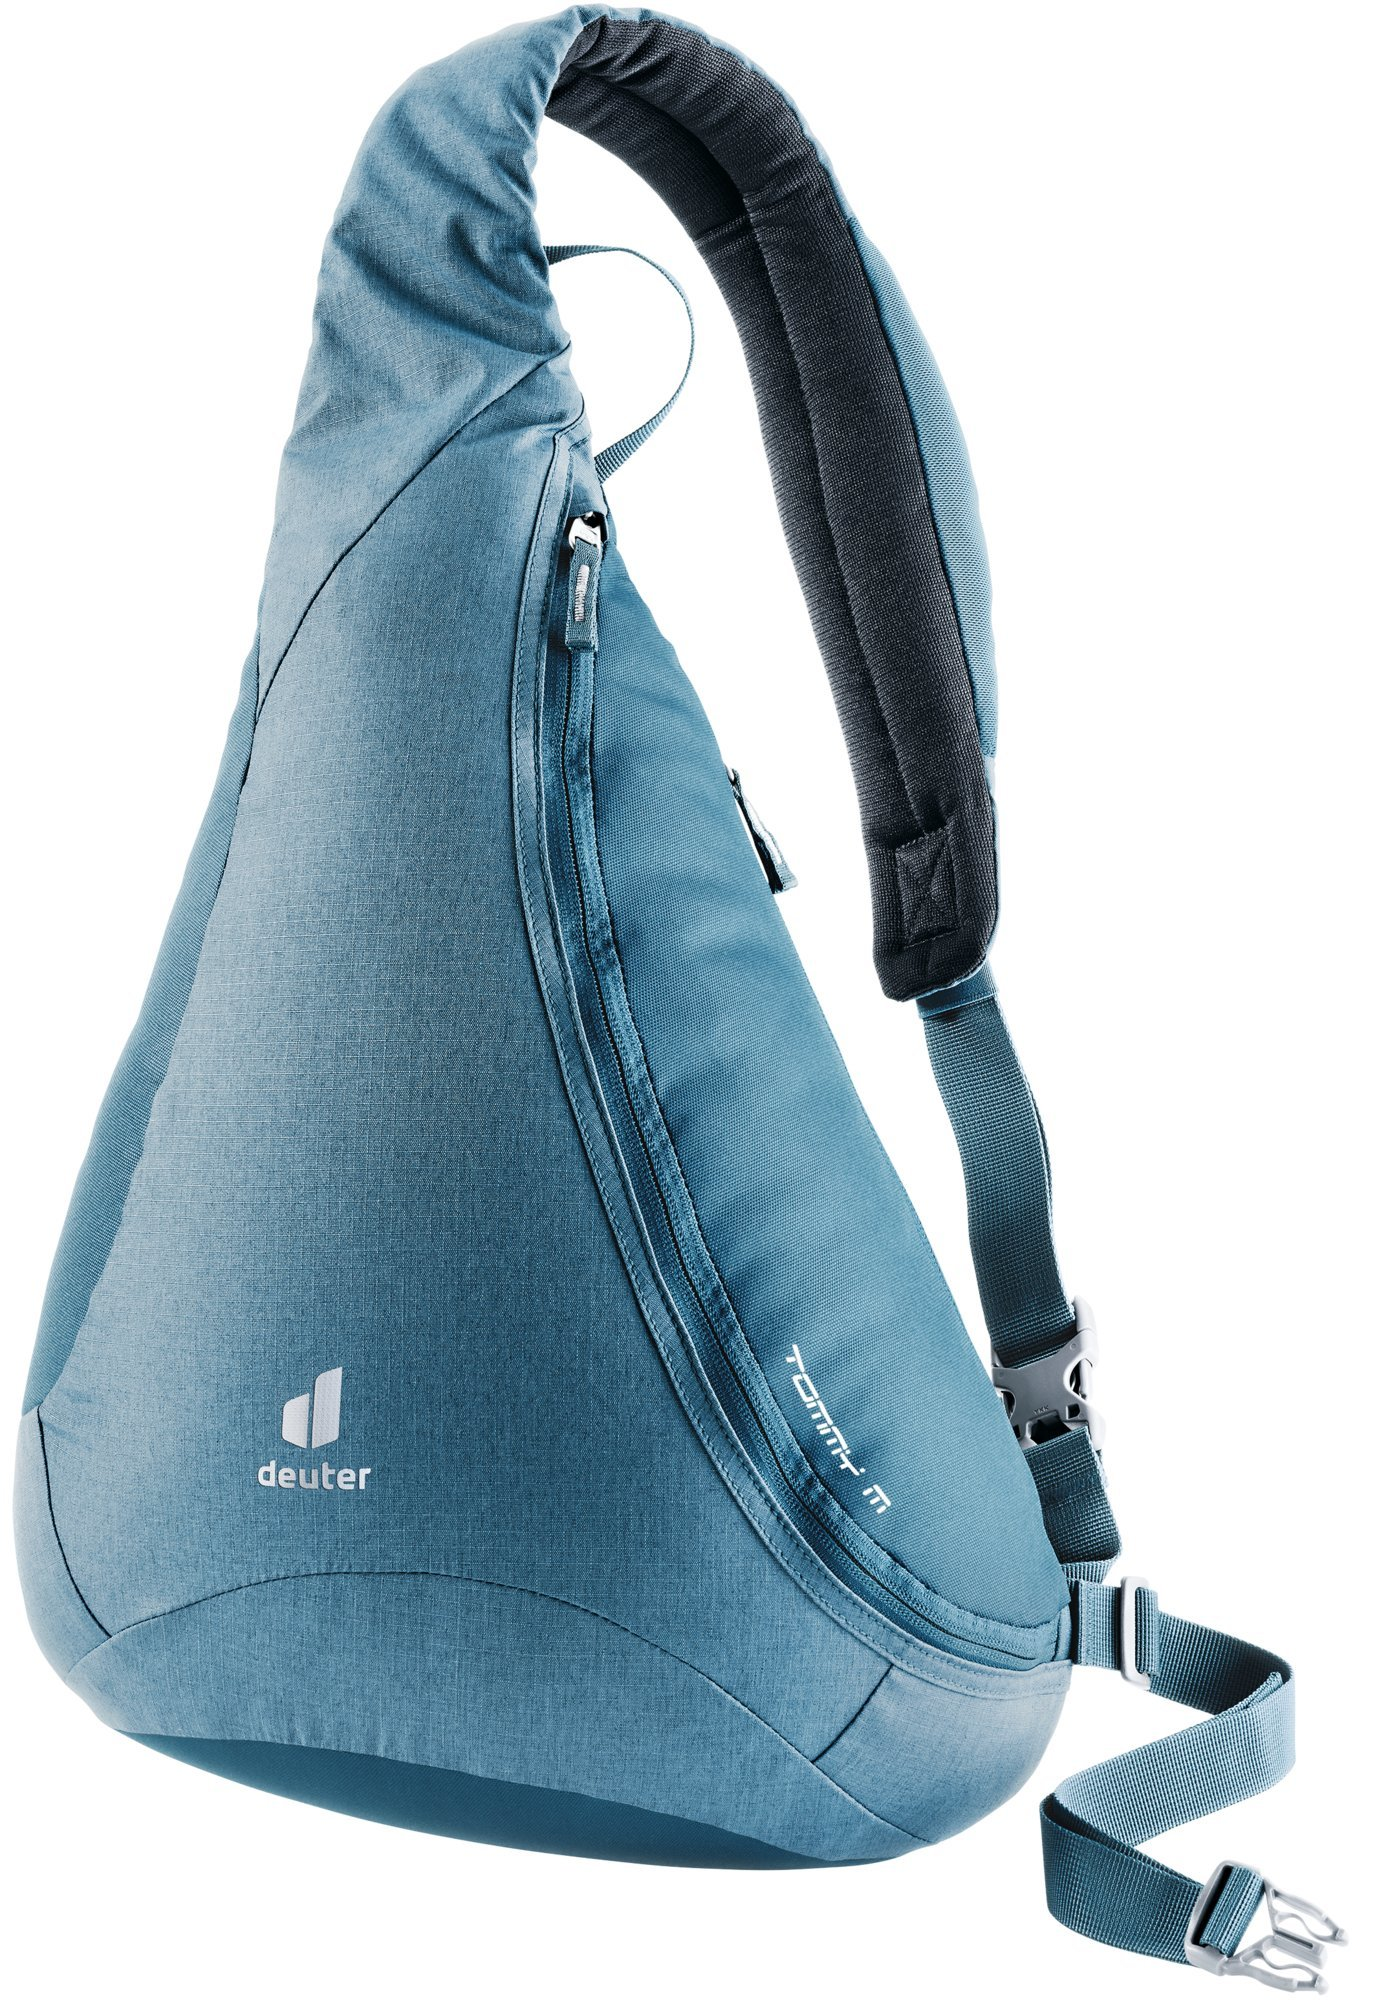 Однолямочные рюкзаки Рюкзак однолямочный Deuter Tommy M (2021) 3800121-3060-TommyM-s19-d0.jpg